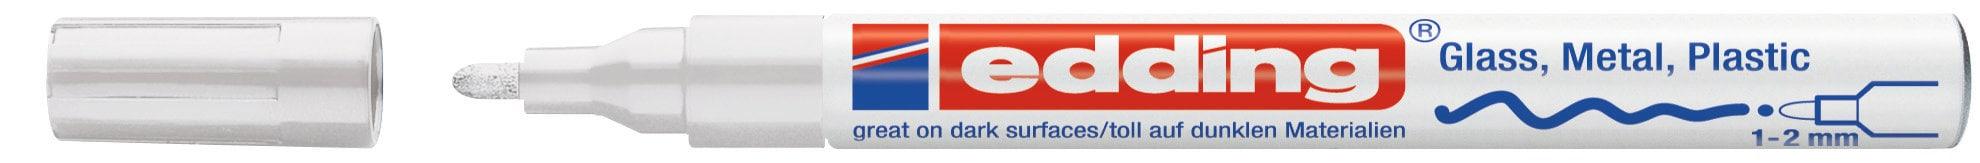 Edding edding marqueur 751 CREA